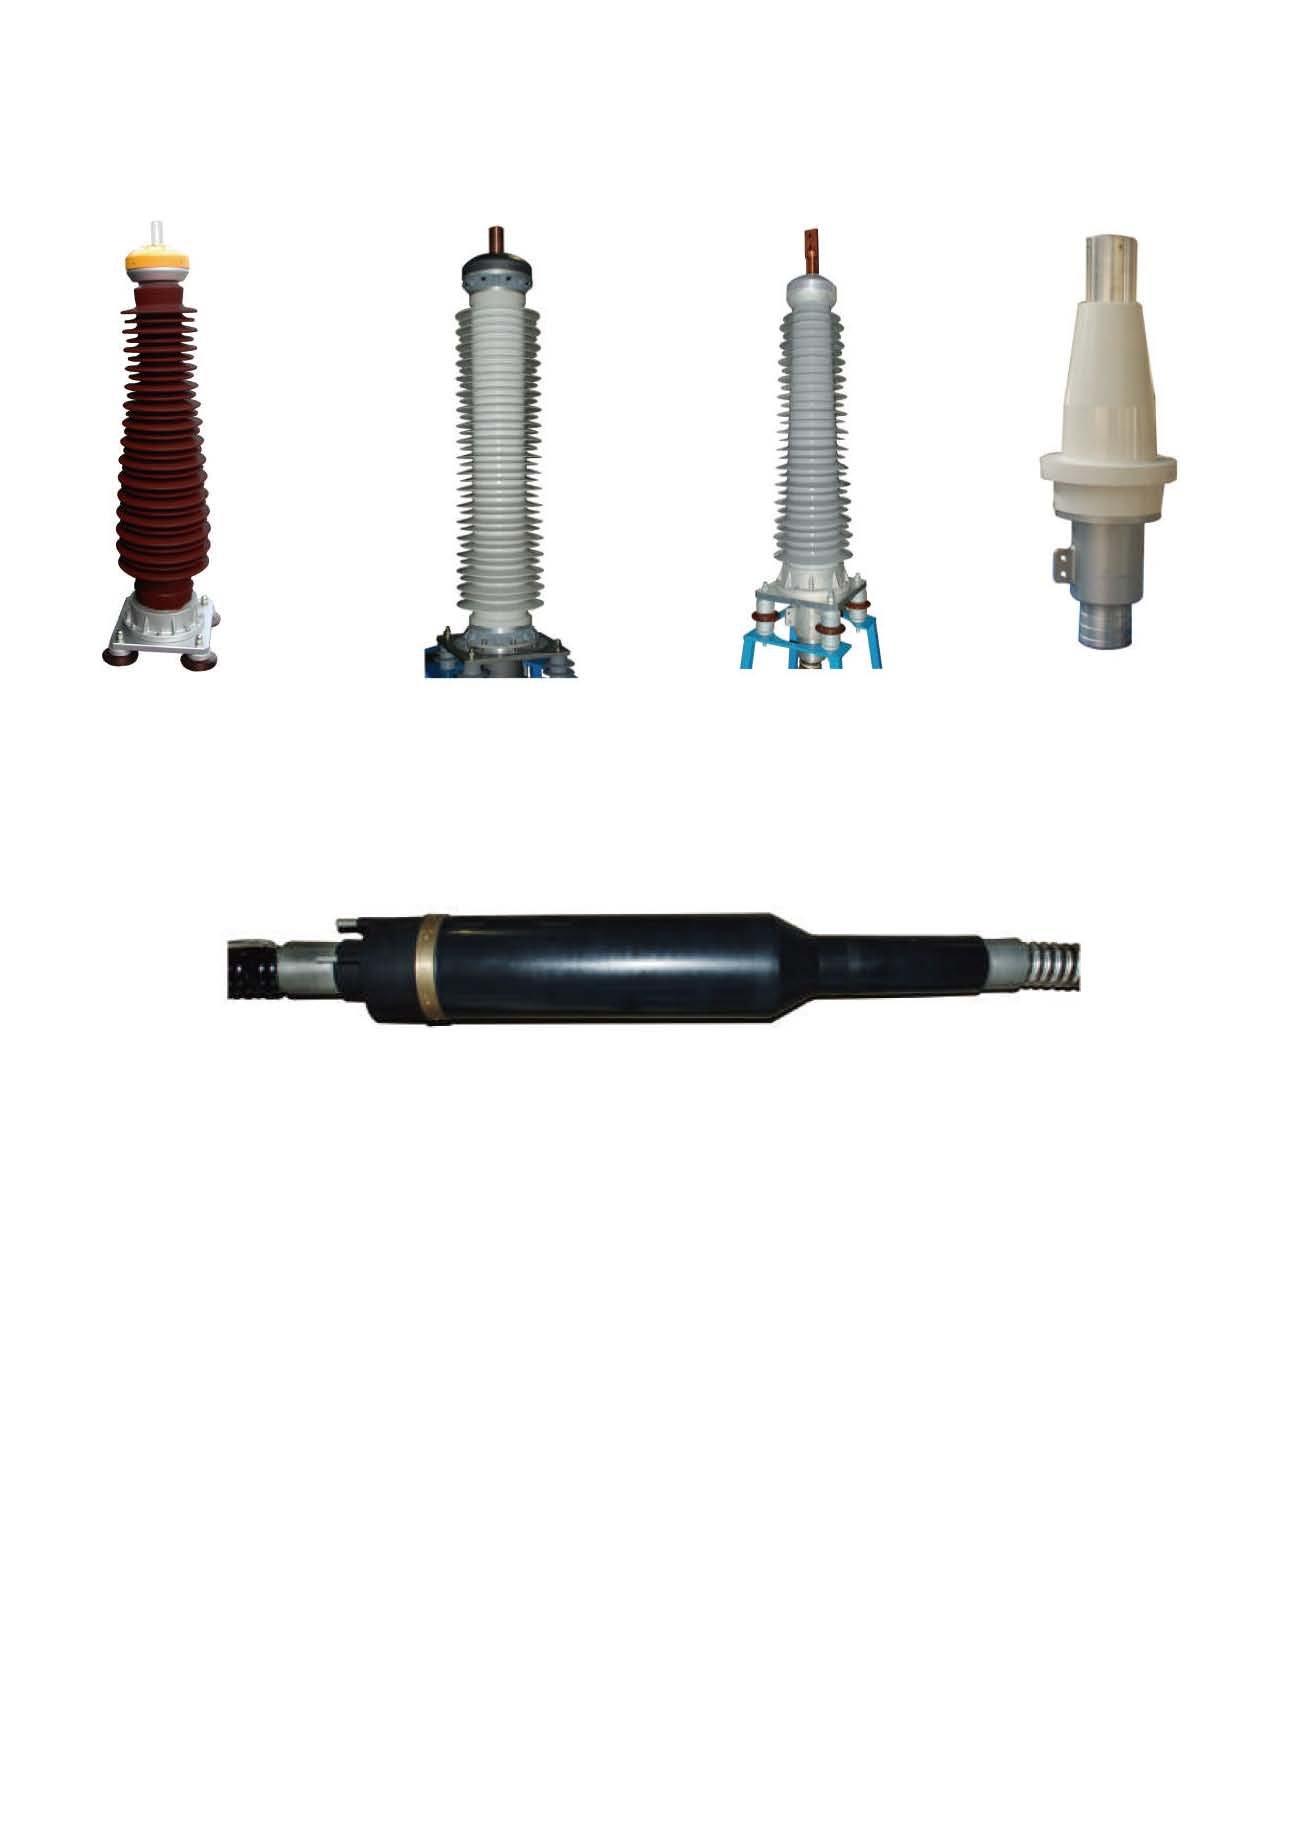 Hv Xlpe Cable : Hv xlpe cable accessories oil filled